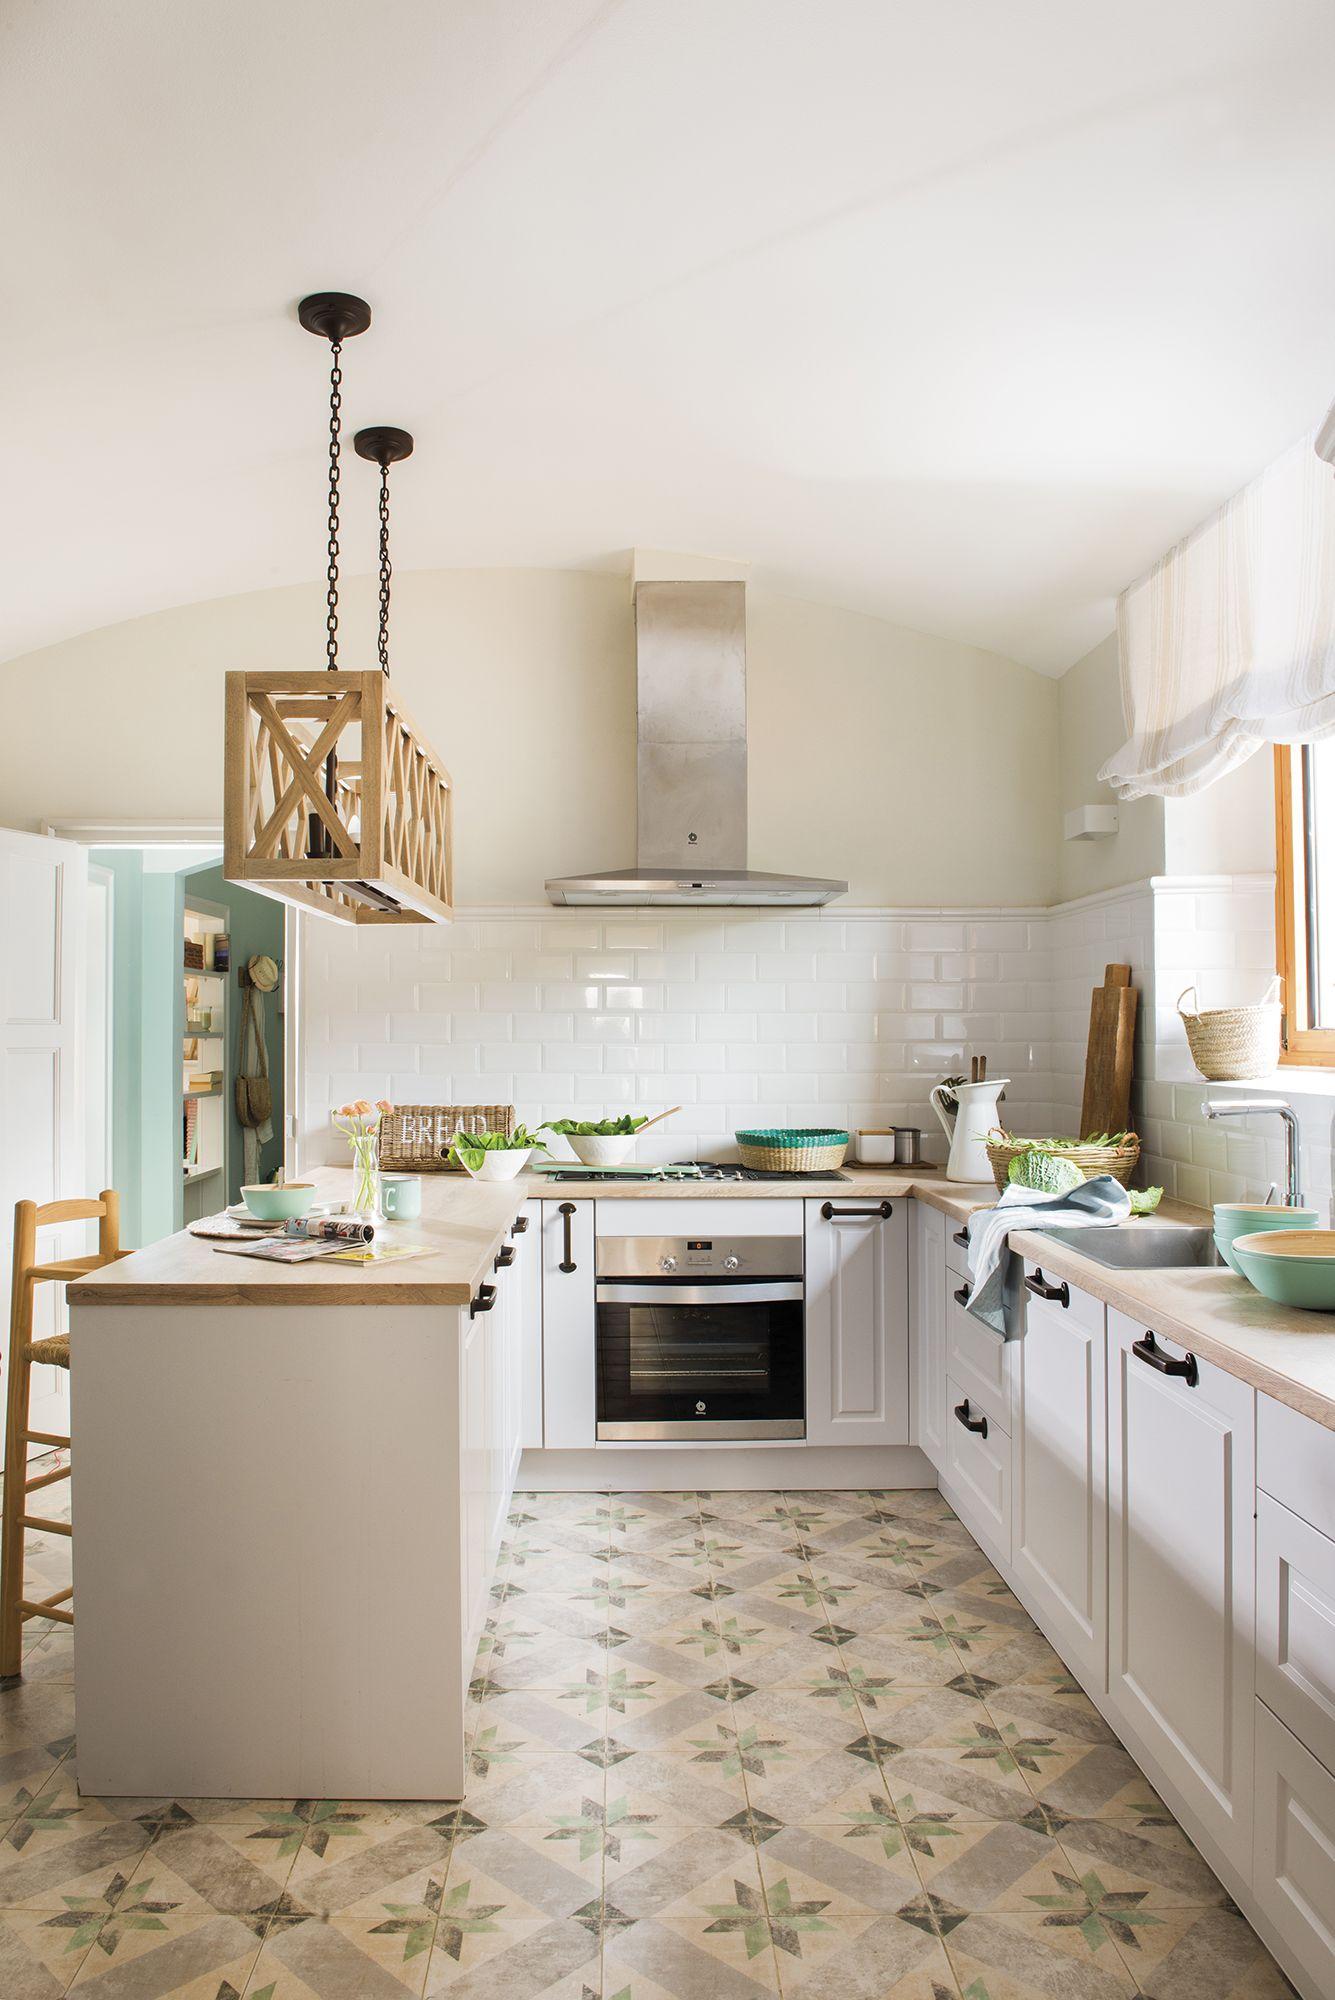 kitchen, white patterned floor, white subway backsplash, white cabinet, wooden counter top